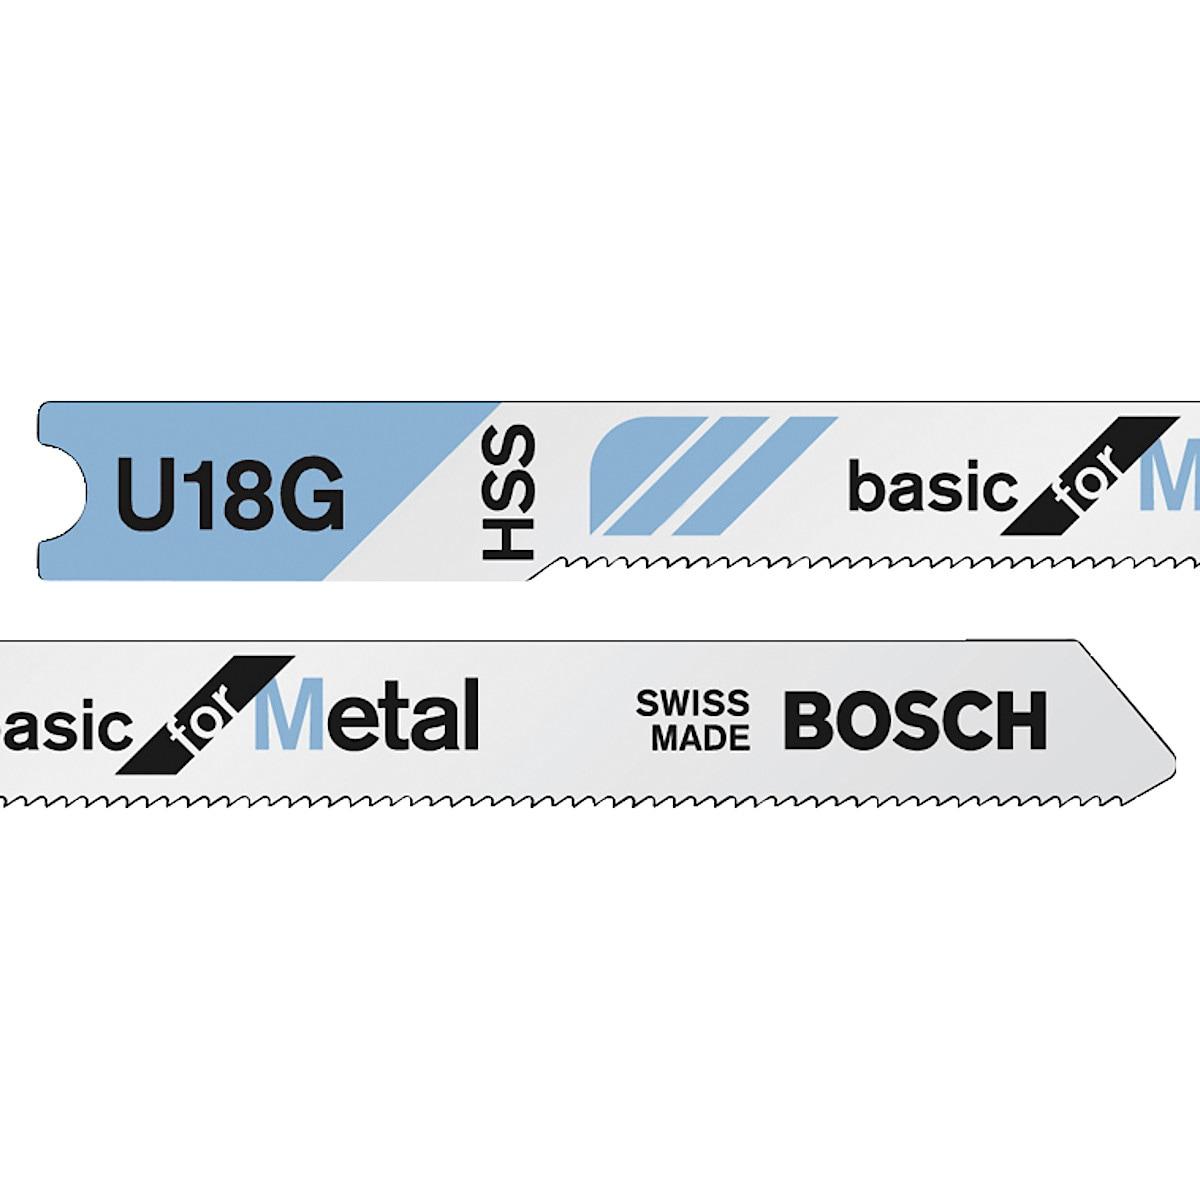 Pistosahanterä HSS U118G Bosch